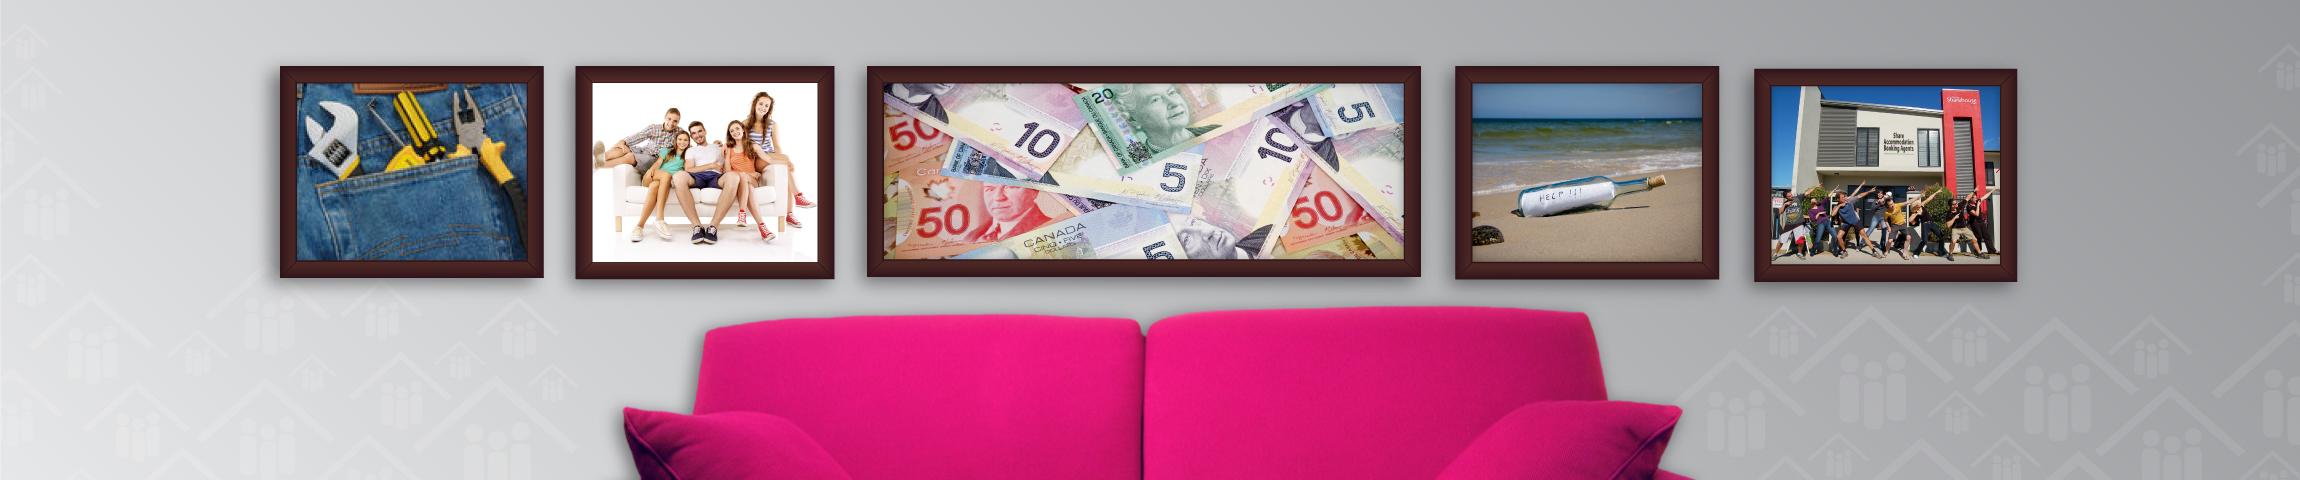 Security Deposit Refund